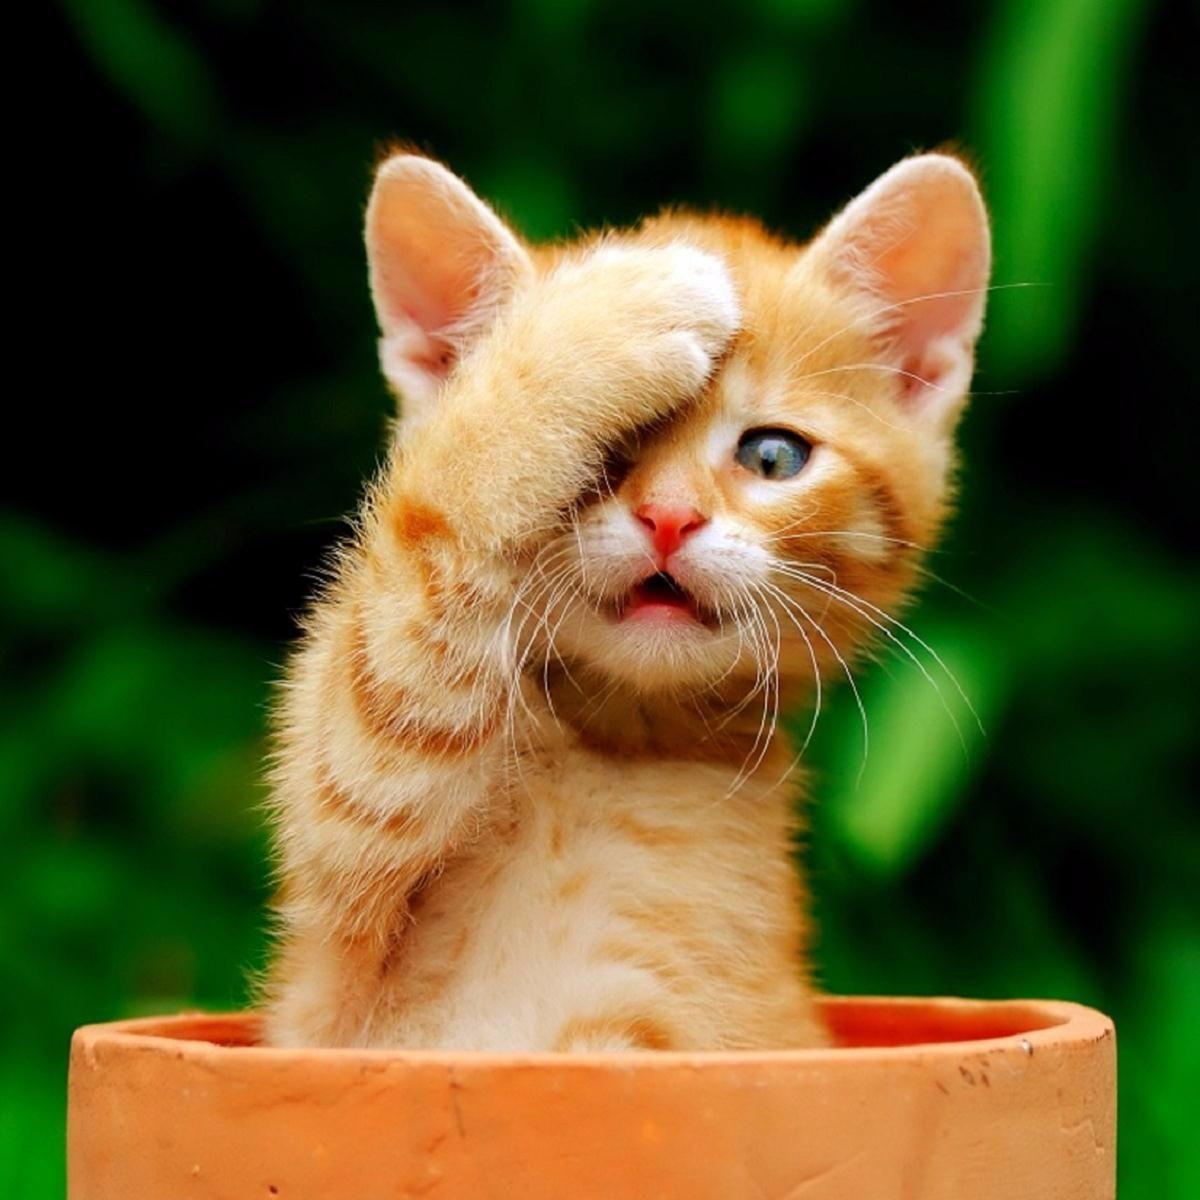 kittens - Google Search …